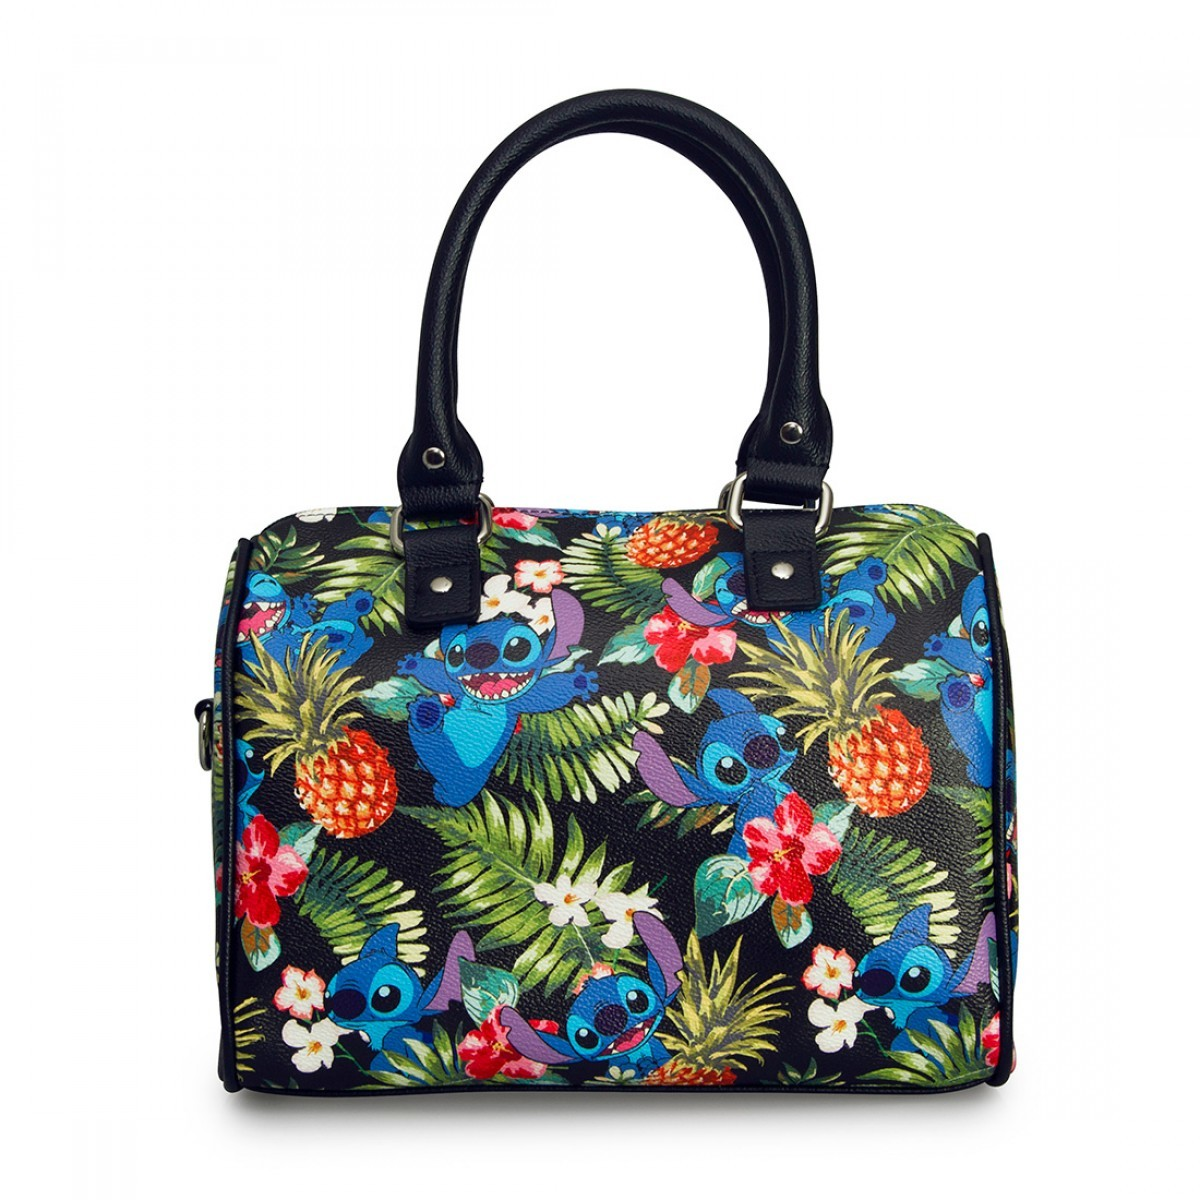 5cc09f044ee ... Loungefly Disney Stitch Hawaiian Print Hand Bag image ...